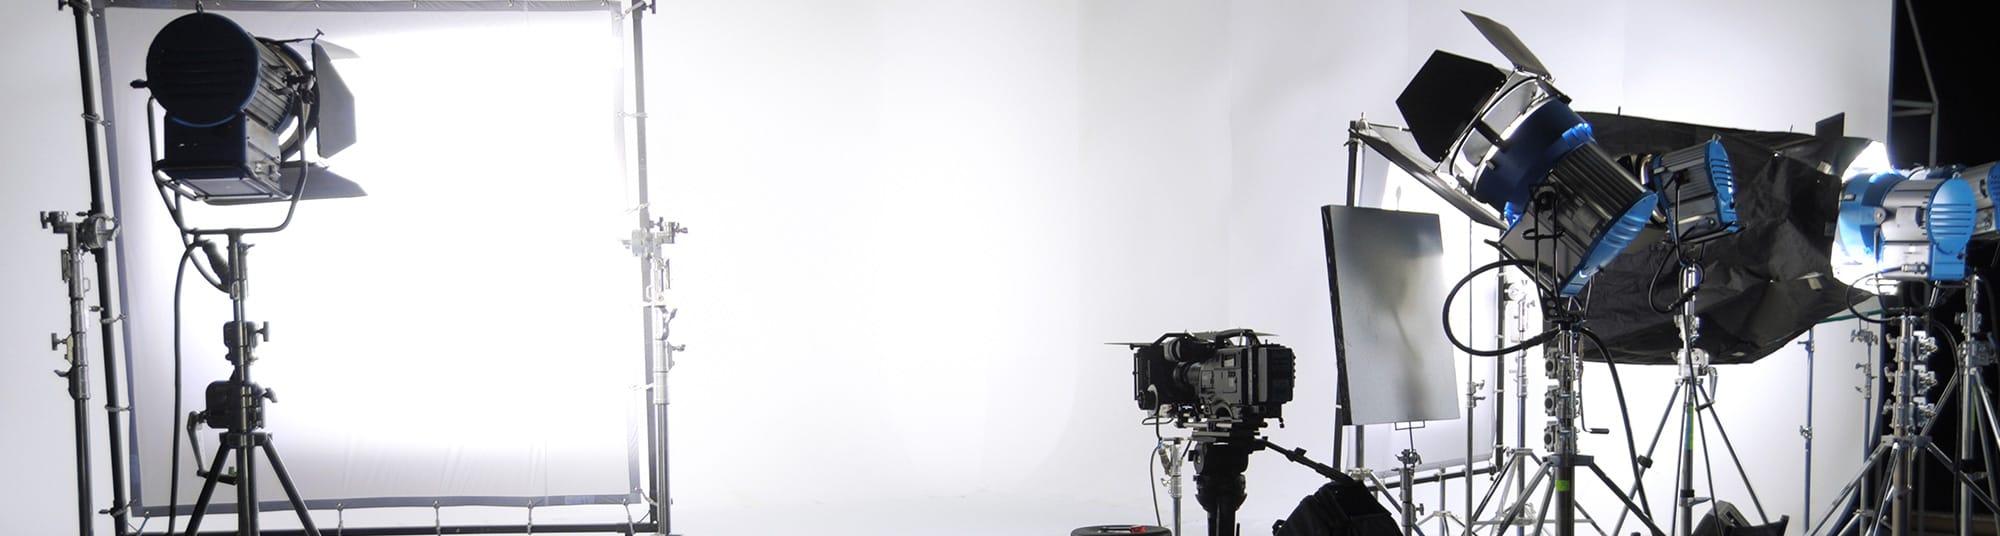 Lighting and Studio for Photography | B&H Photo